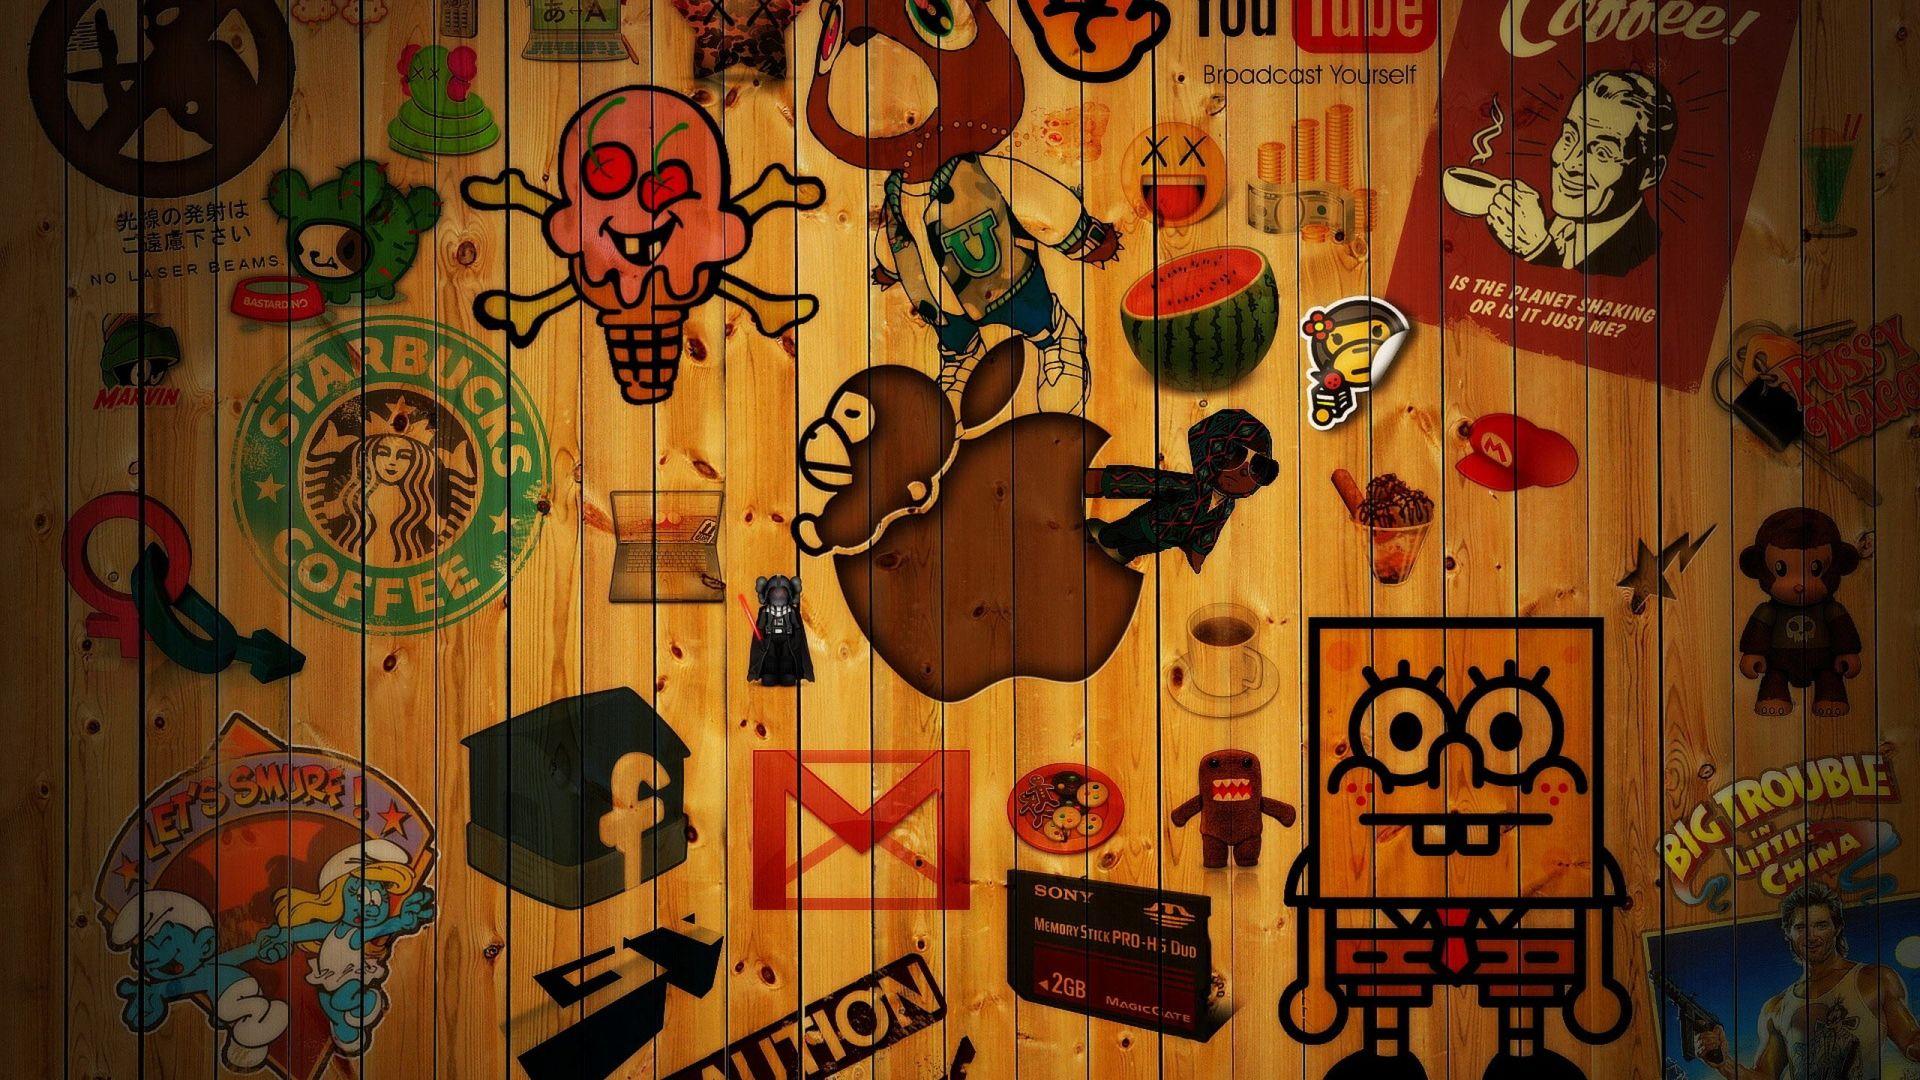 Art Hipster Fond Ecran 10 000 Fonds D Ecran Hd Gratuits Et De Qualite Wallpapers Hd